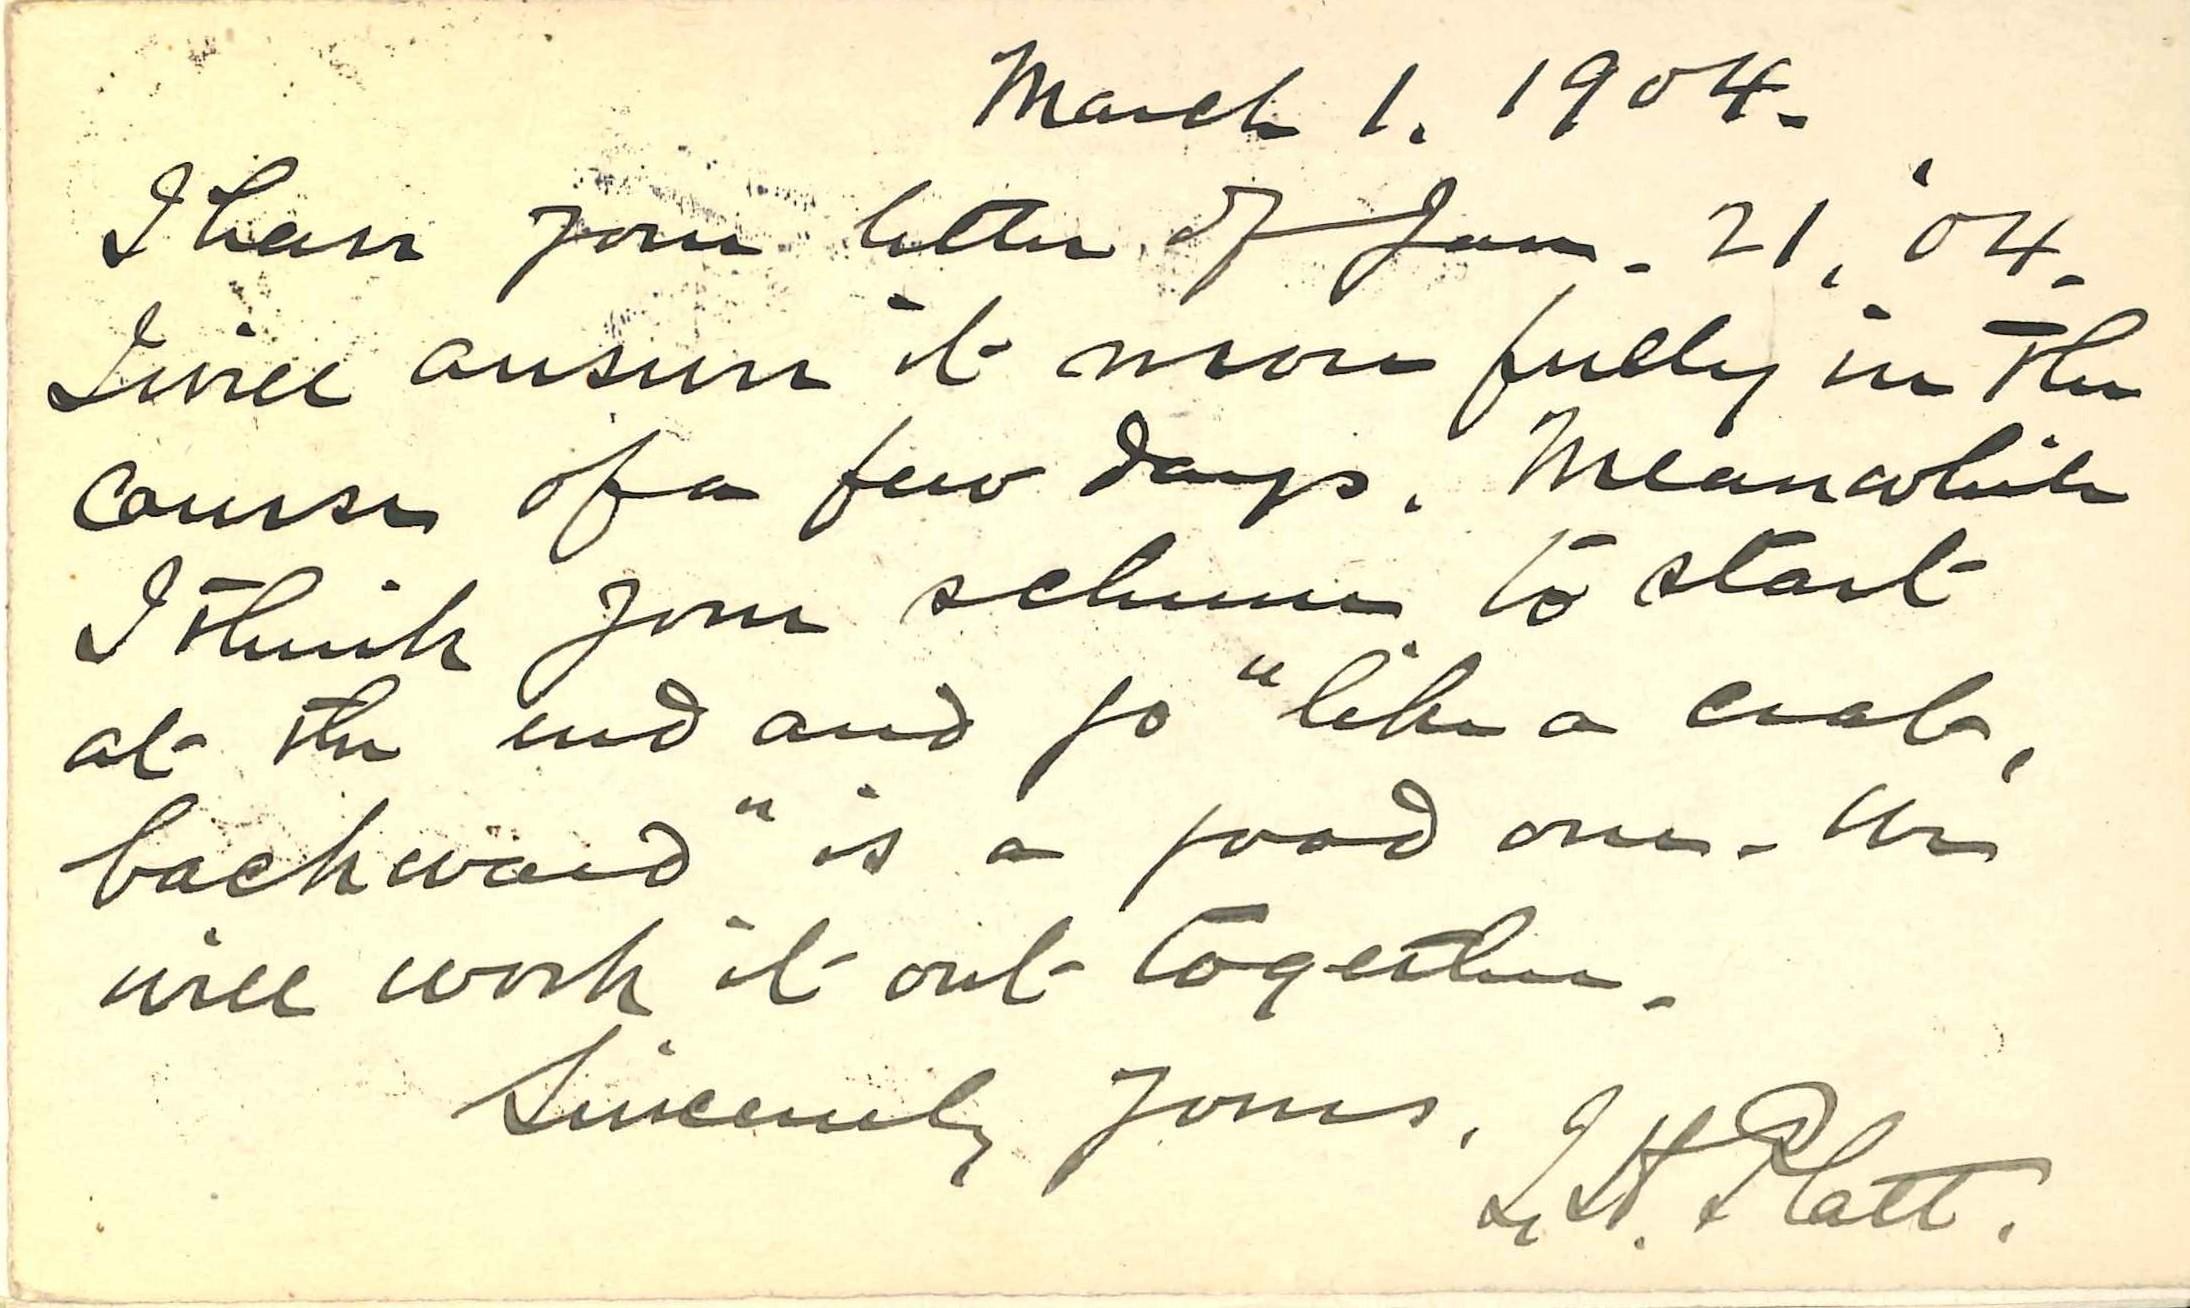 Postcard, March 1, 1904, Isaac Hull Platt to W.H. Trimble. Affixed to front endpaper of: Isaac Hull Platt. Walt Whitman. Boston: Small, Maynard, 1904.